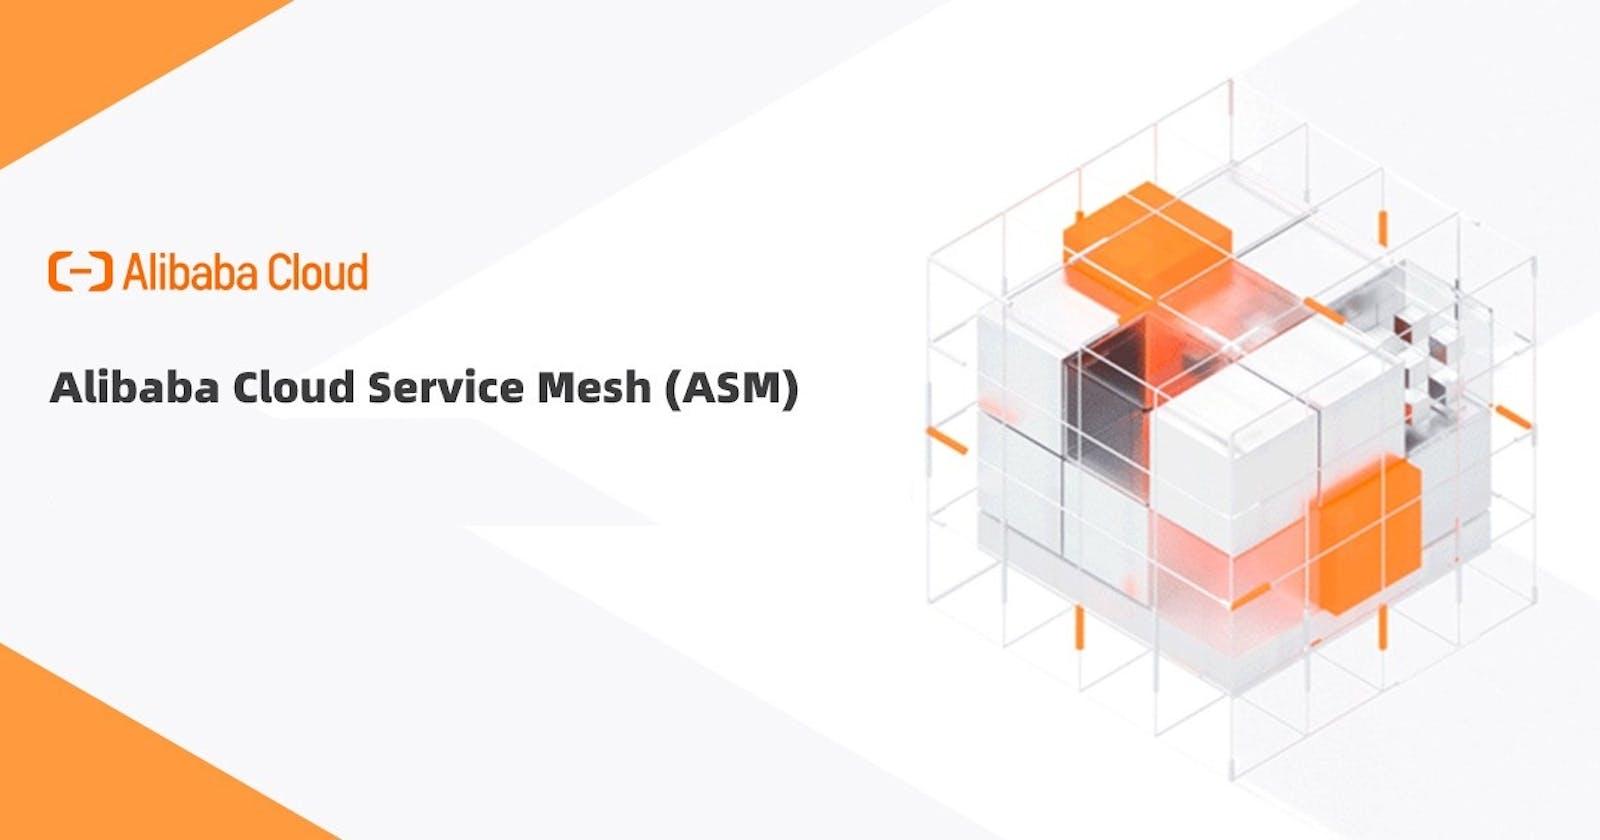 Alibaba Cloud Service Mesh (ASM)